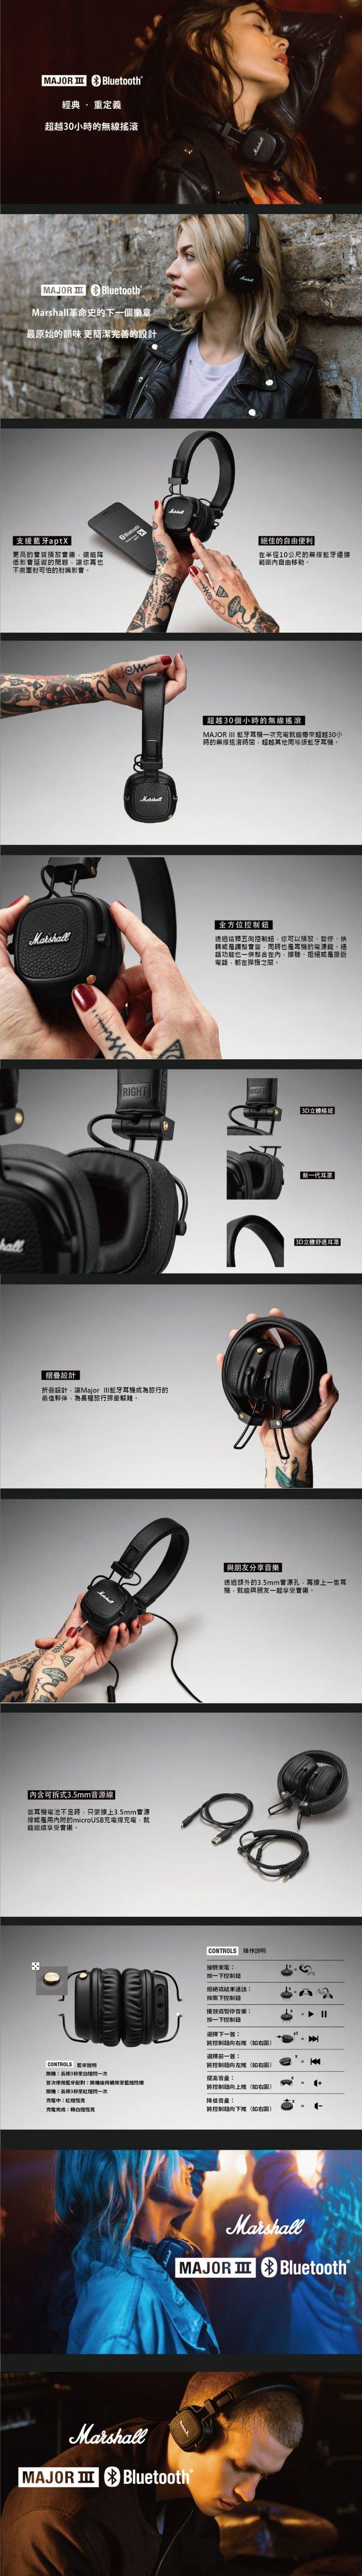 (複製)Marshall|Major III Bluetooth 藍牙耳罩式耳機 - 經典黑